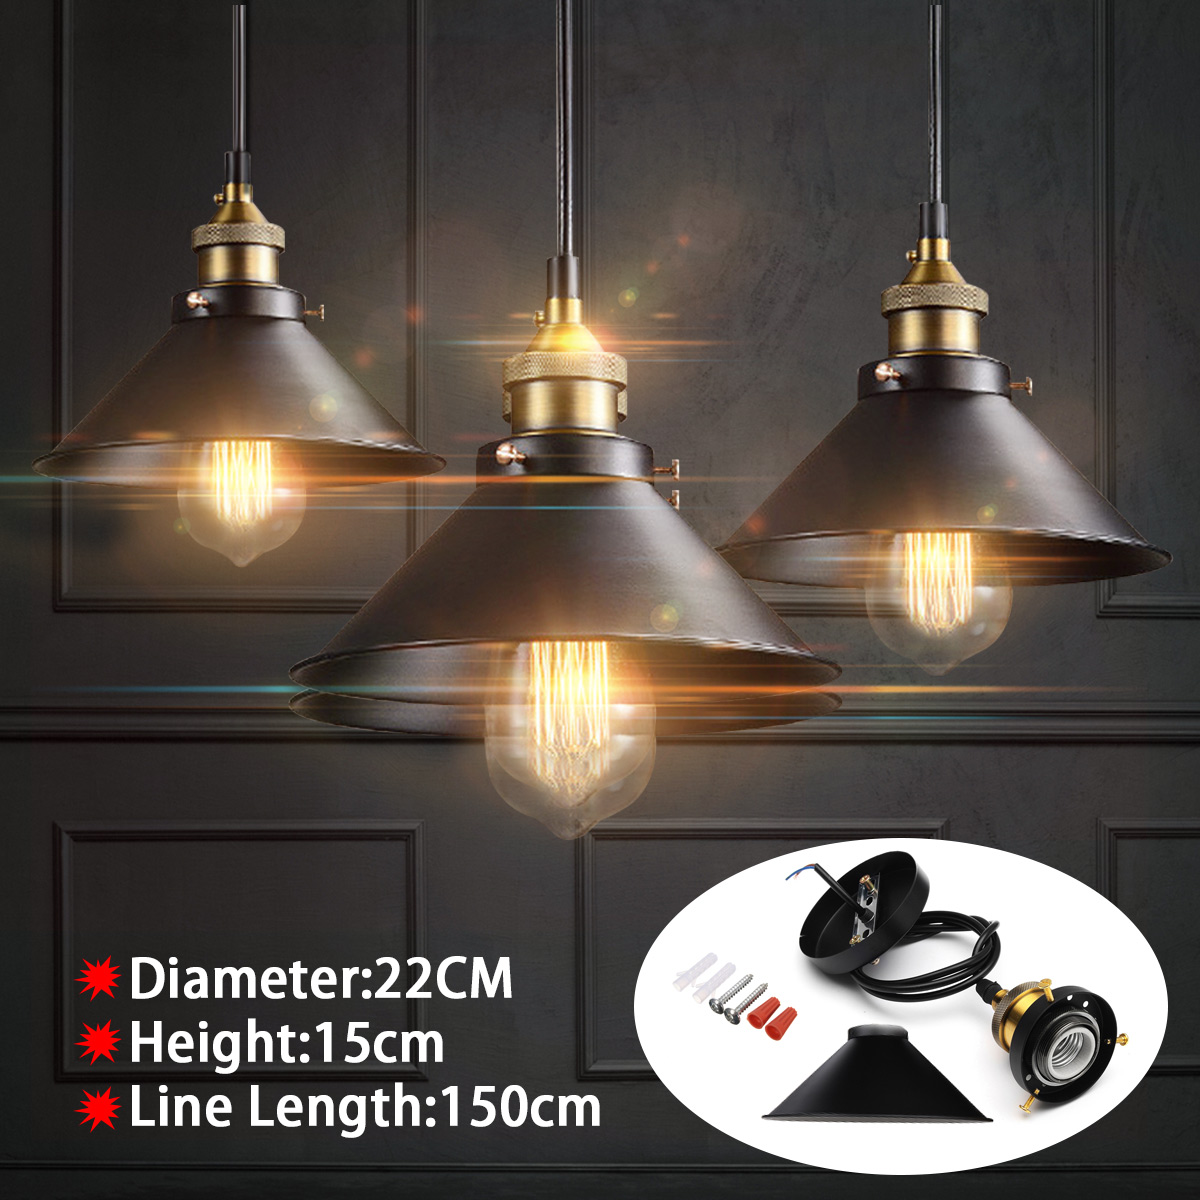 Loft Vintage Industrial Pendant Light Nordic Retro Iron Lights Edison Lamp Lighting Fixture For Cafe Bar Home Lighting